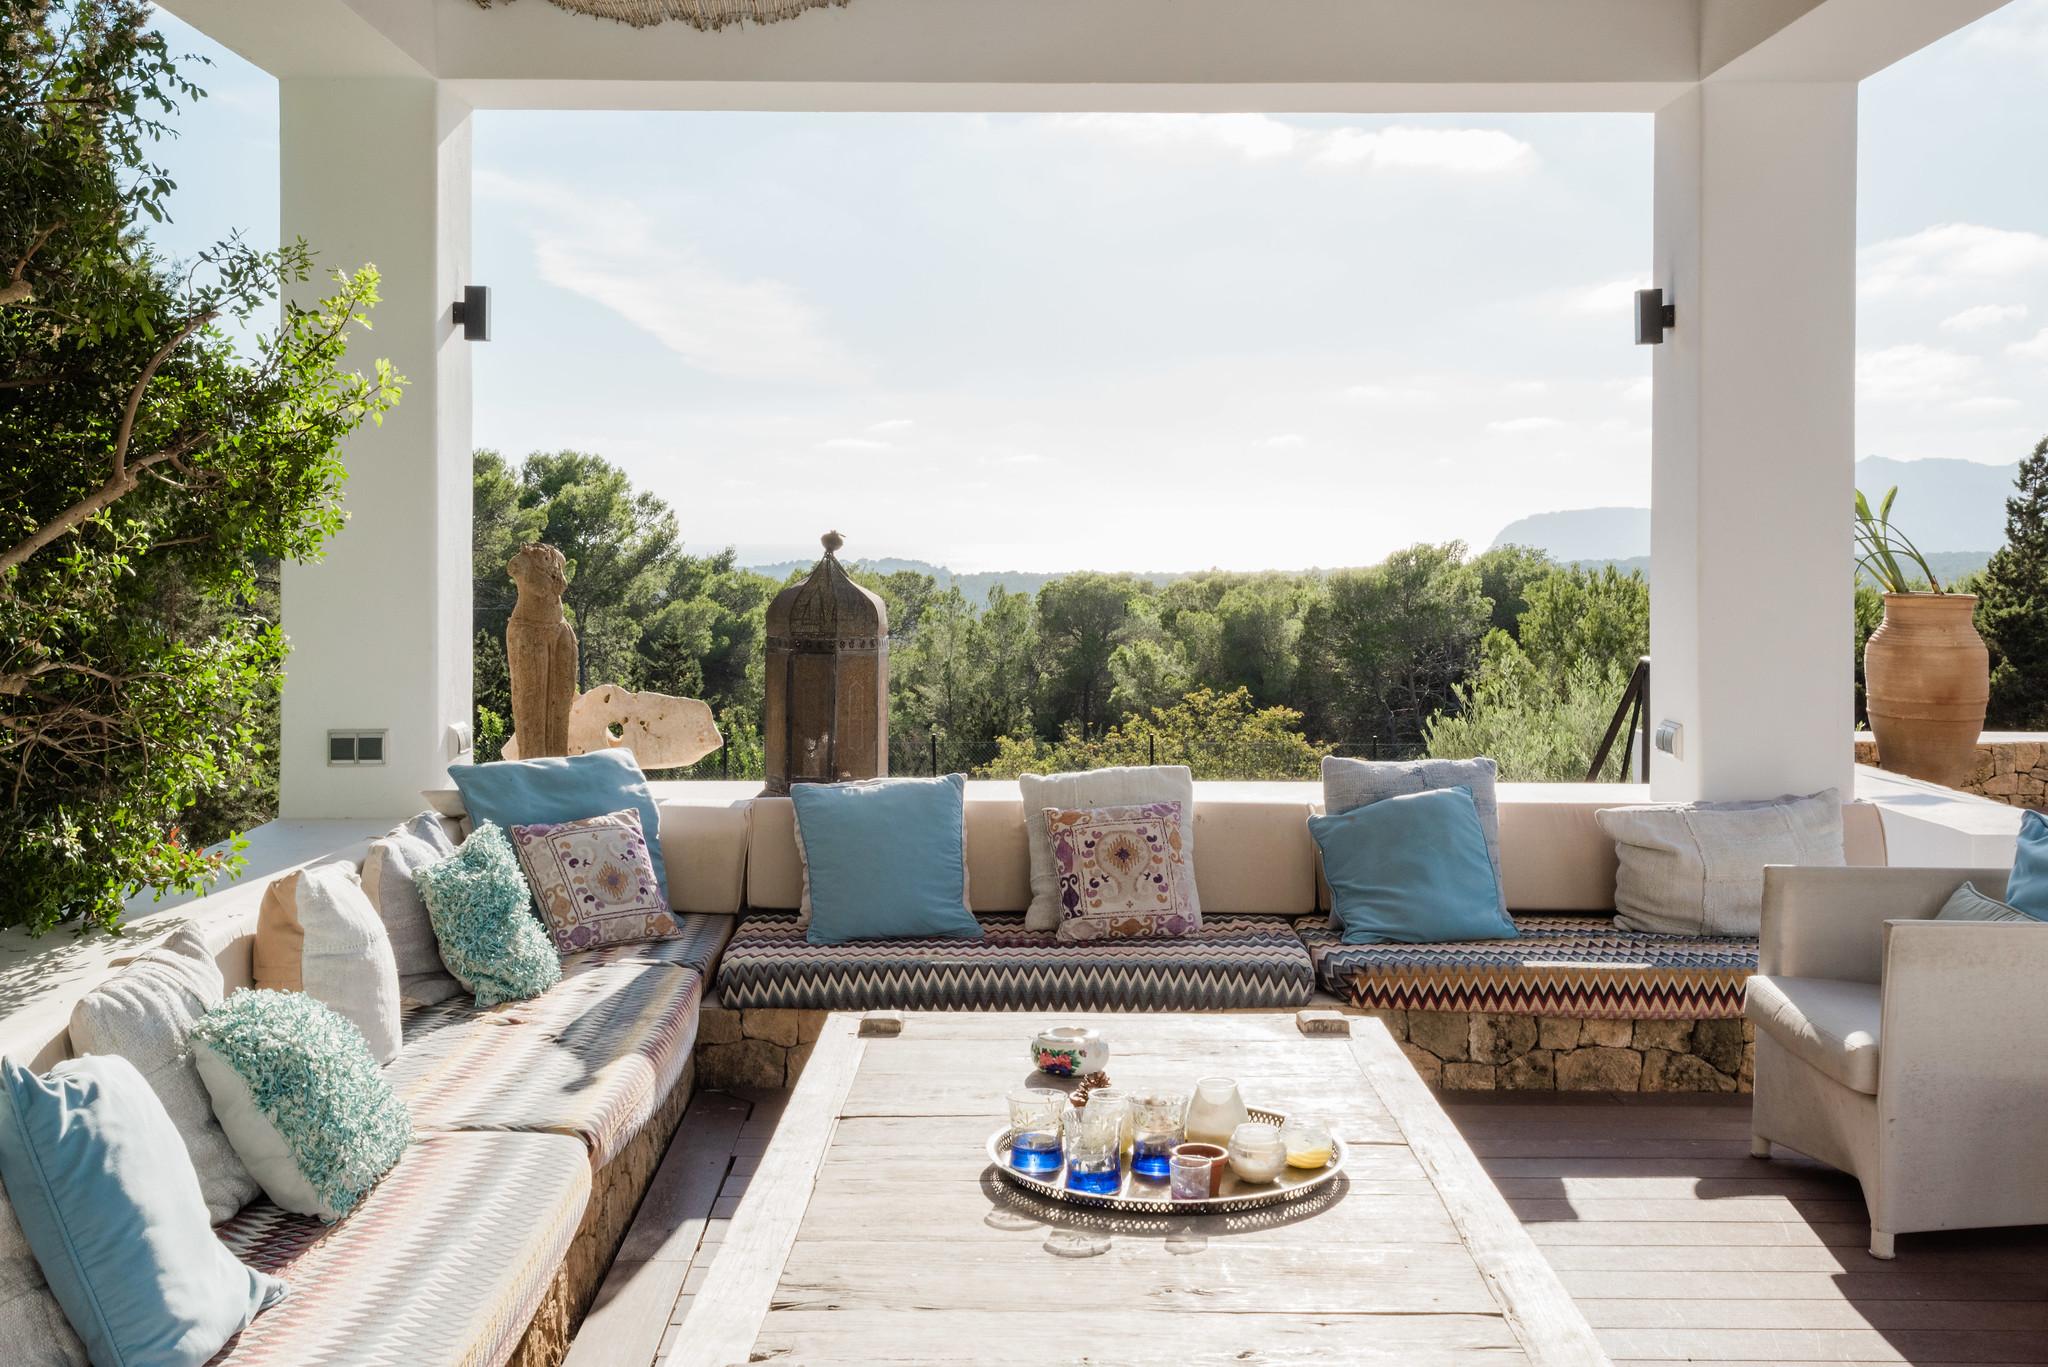 https://www.white-ibiza.com/wp-content/uploads/2020/05/white-ibiza-villas-casa-amalia-exterior-seating.jpg